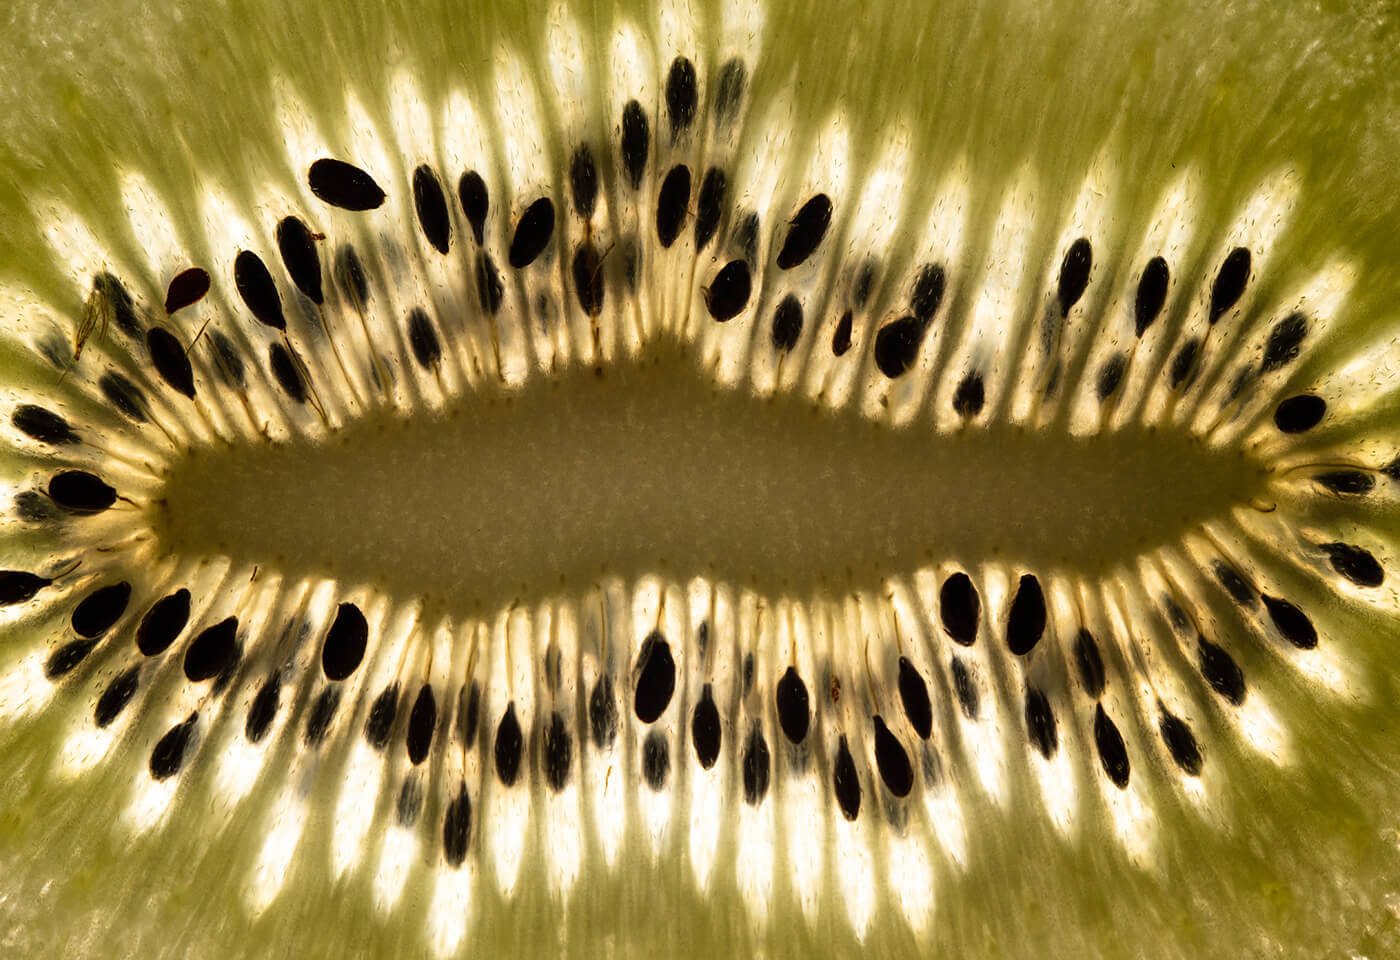 Macro image of a kiwi fruit